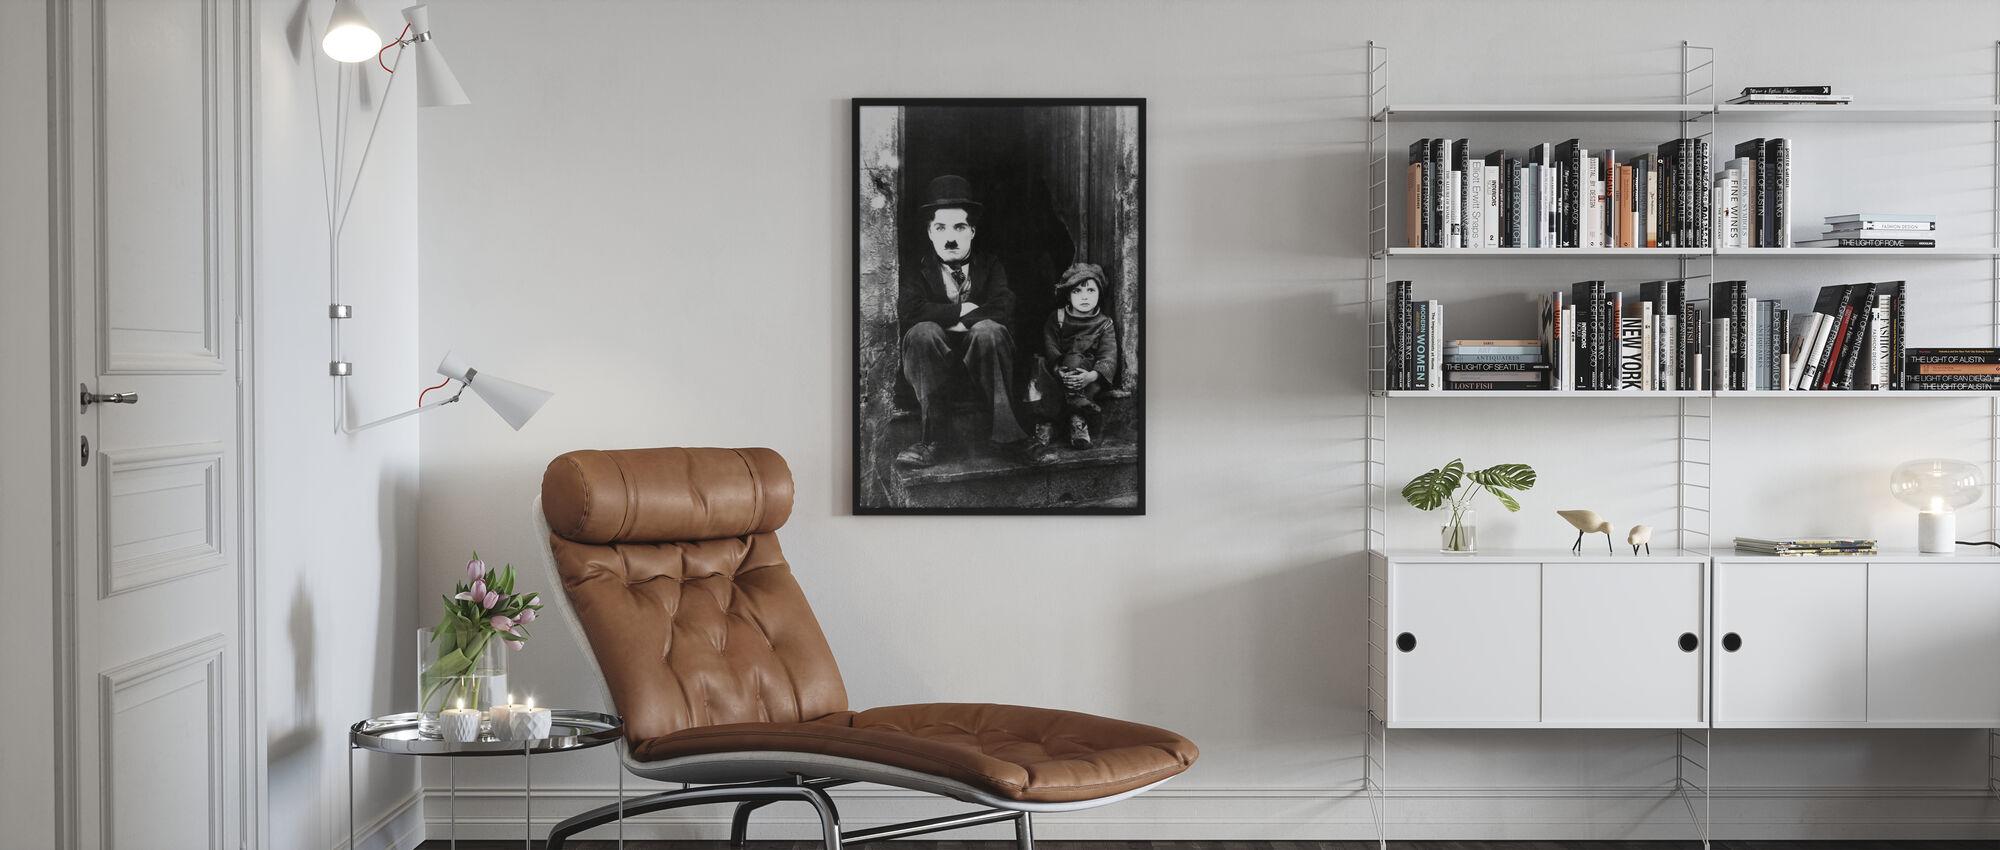 Charlie Chaplin and Jackie Coogan - Poster - Living Room